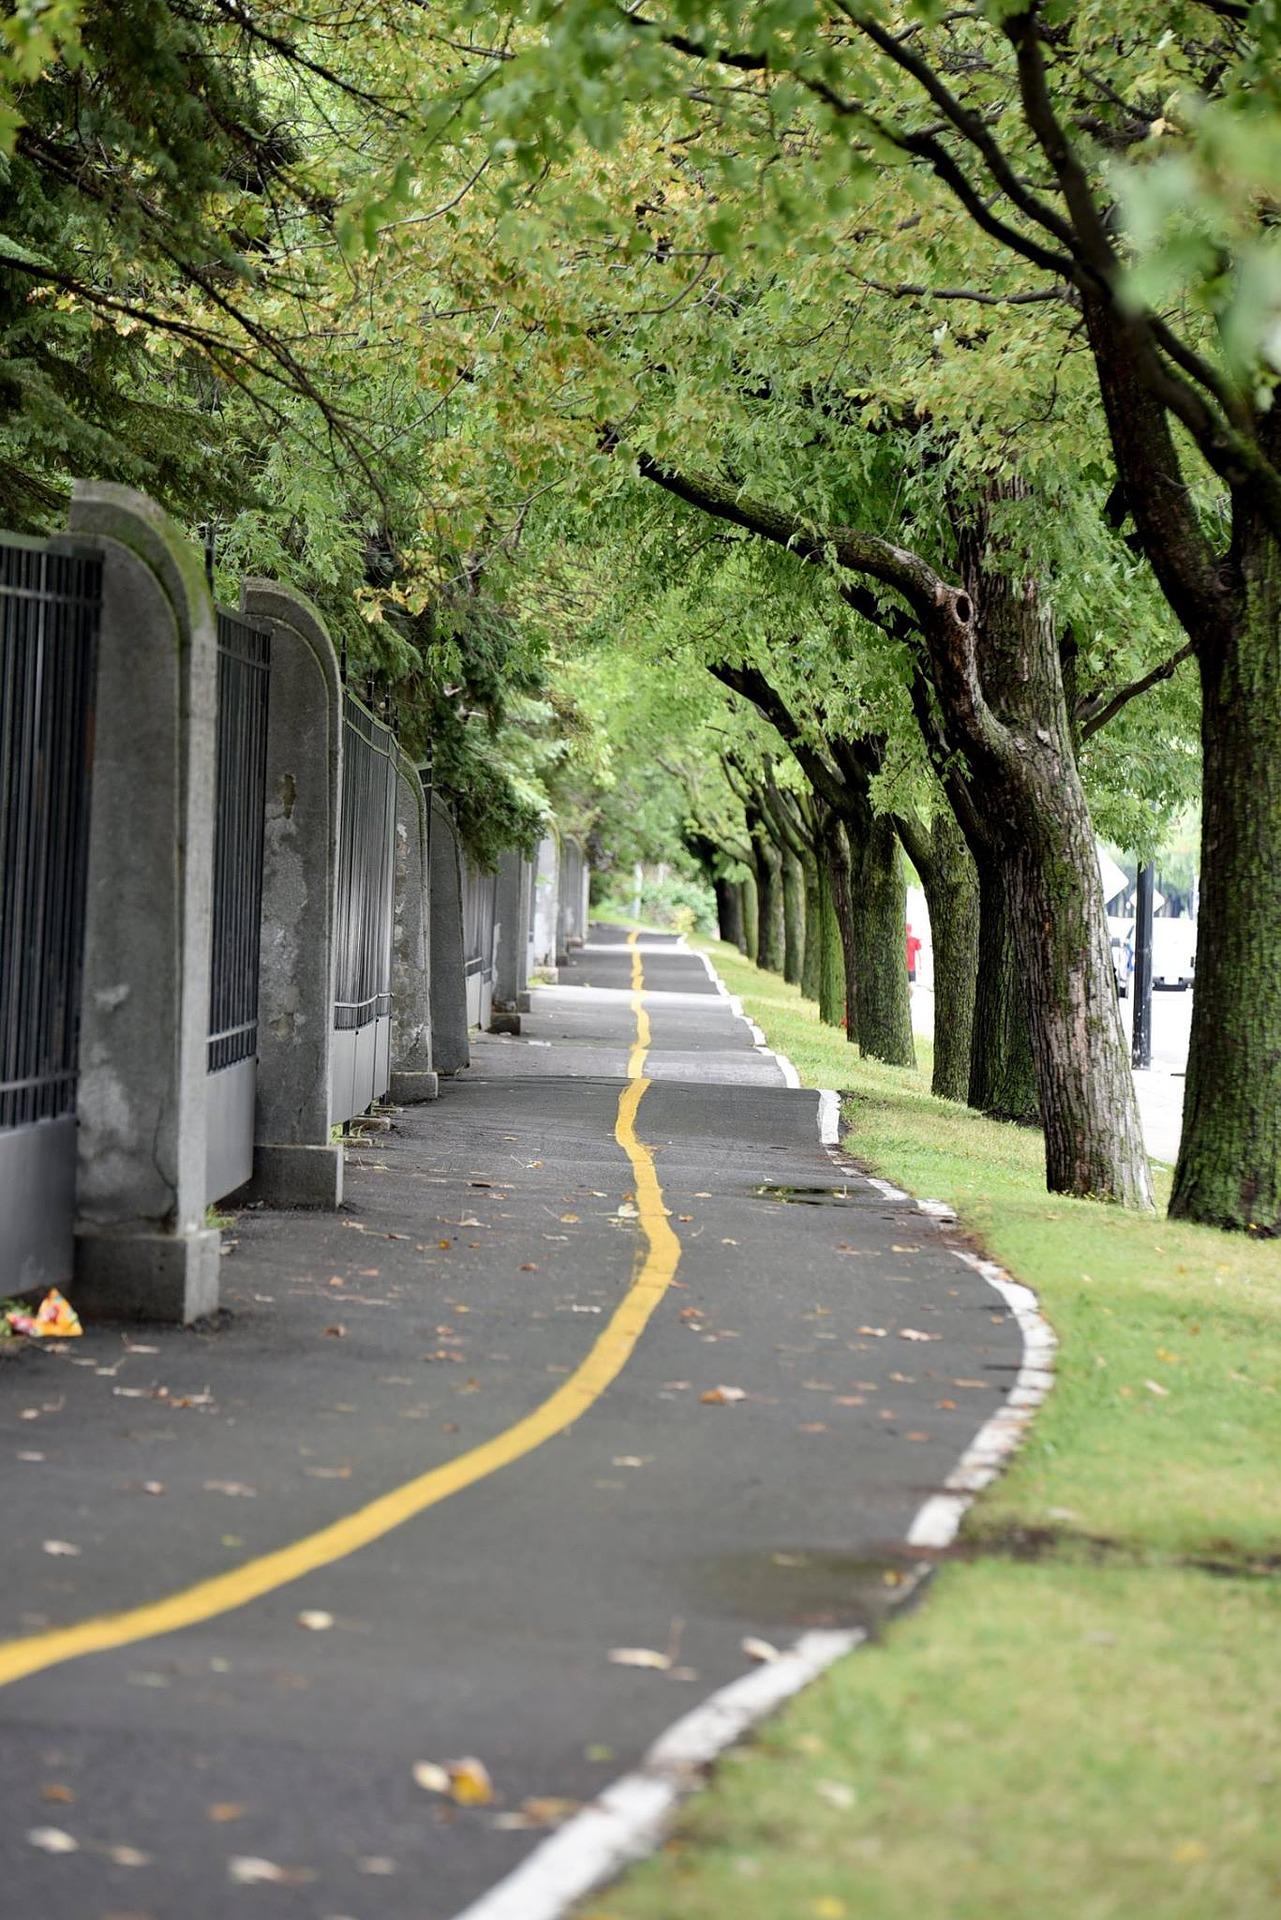 bicycle-path-2770434_1920.jpg